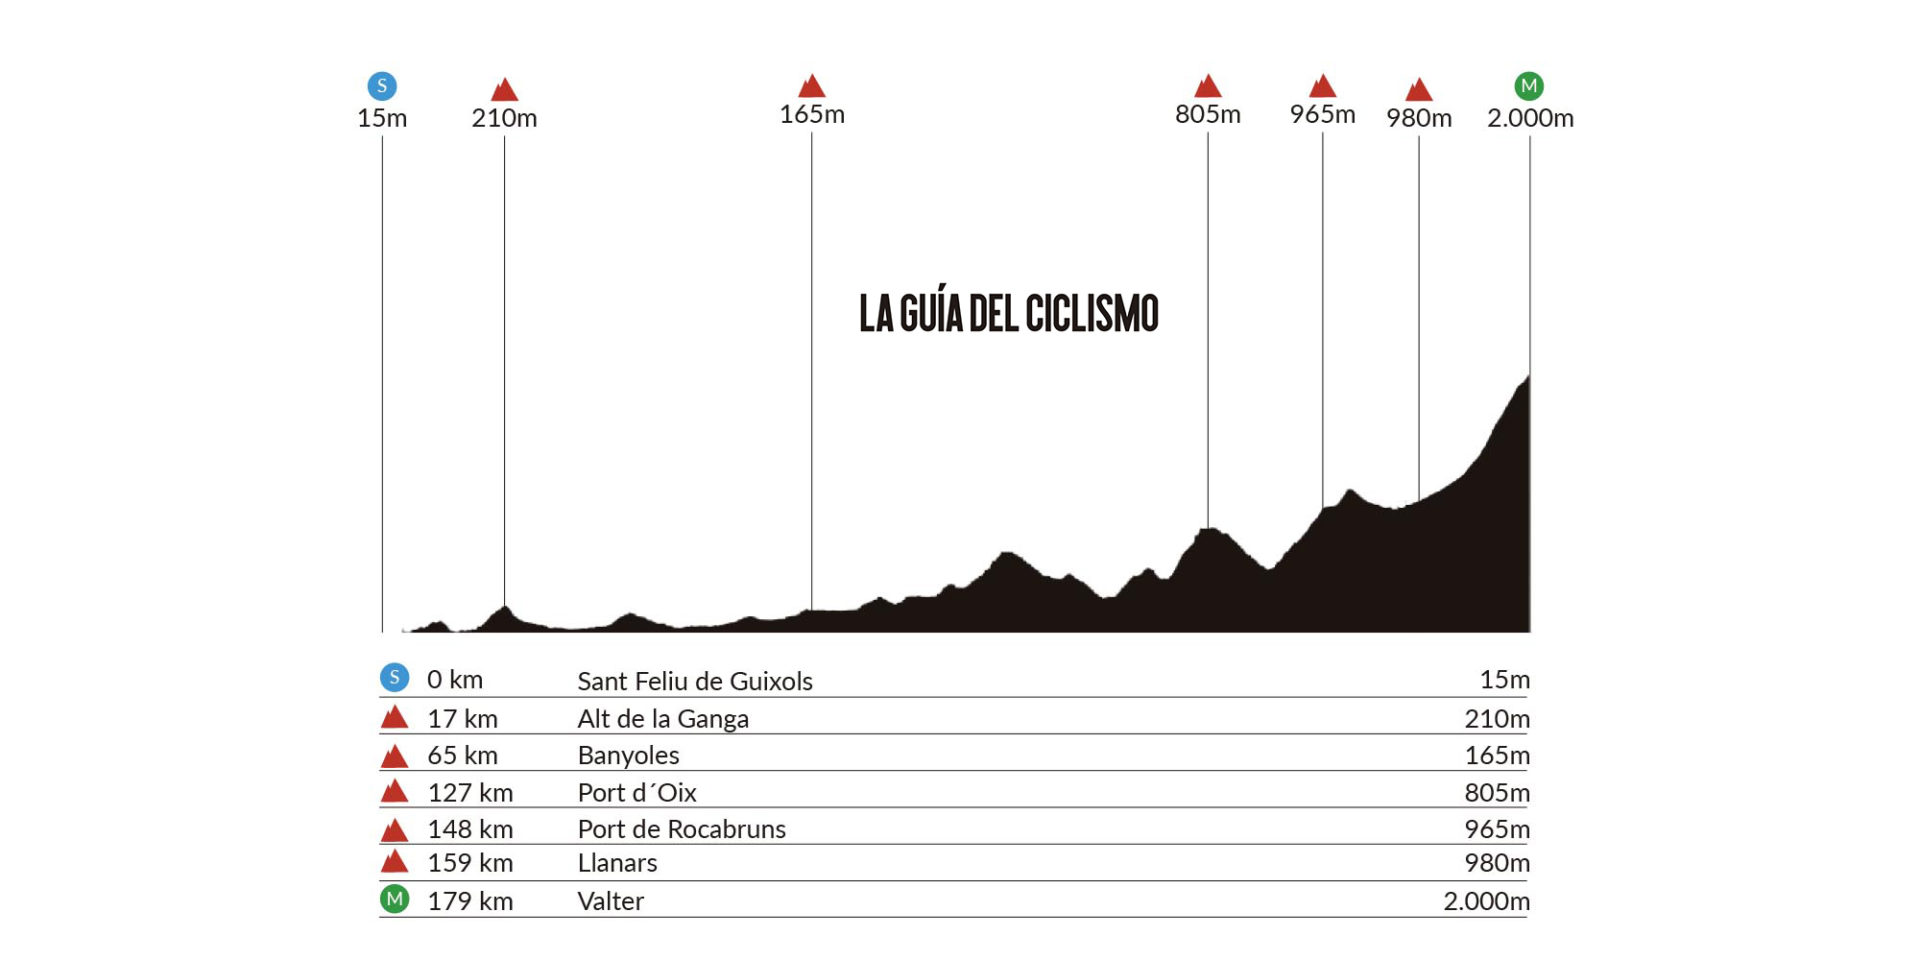 Sant Feliu de Guíxols – Vallter 2000. 179 kms